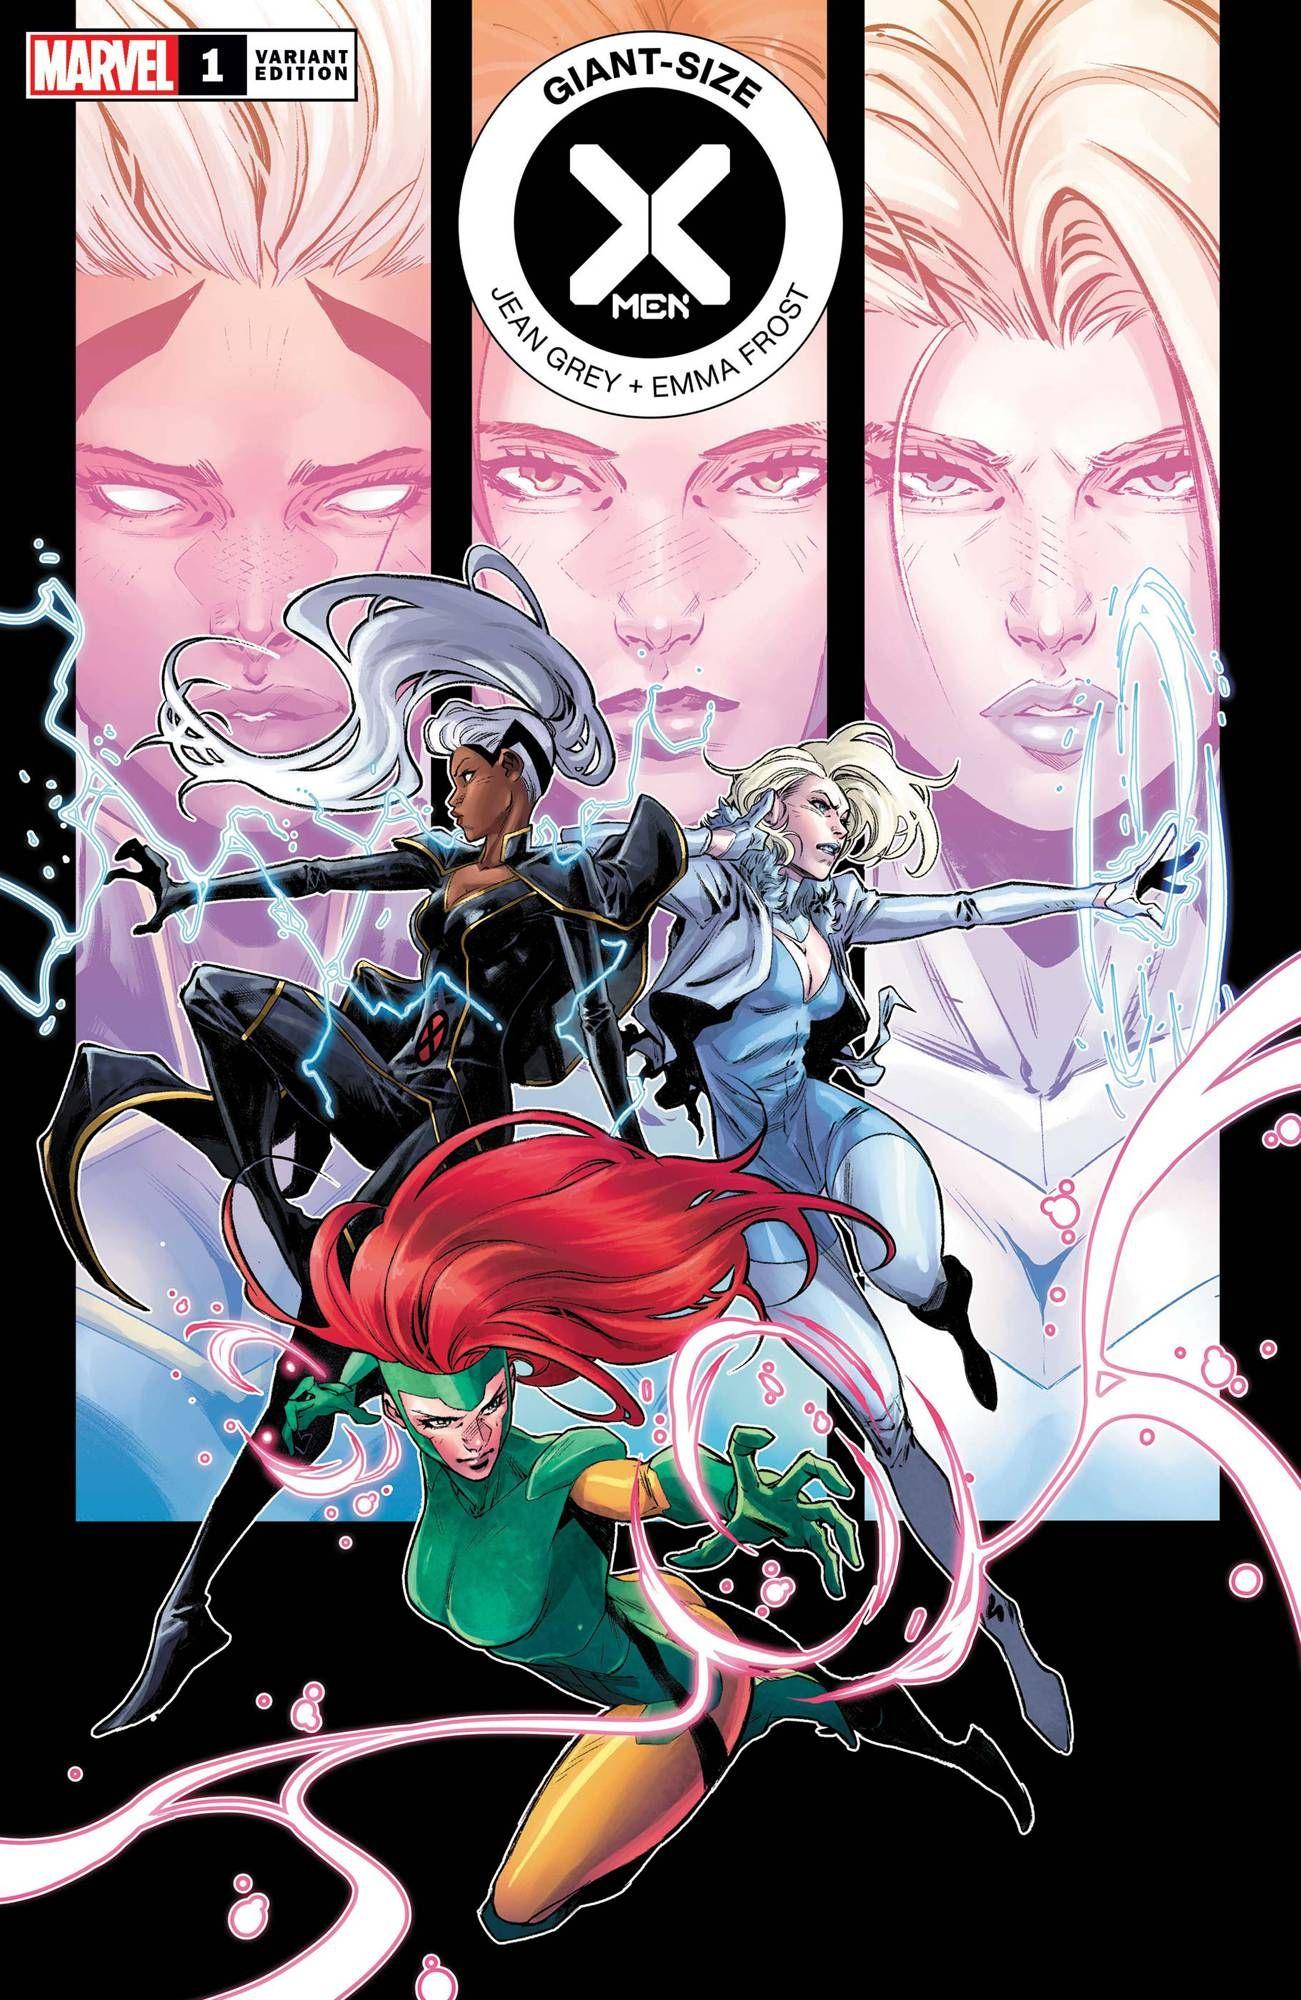 Giant Size X Men Jean Grey Emma Frost 1 Dx In 2020 Emma Frost Marvel Marvel Character Design